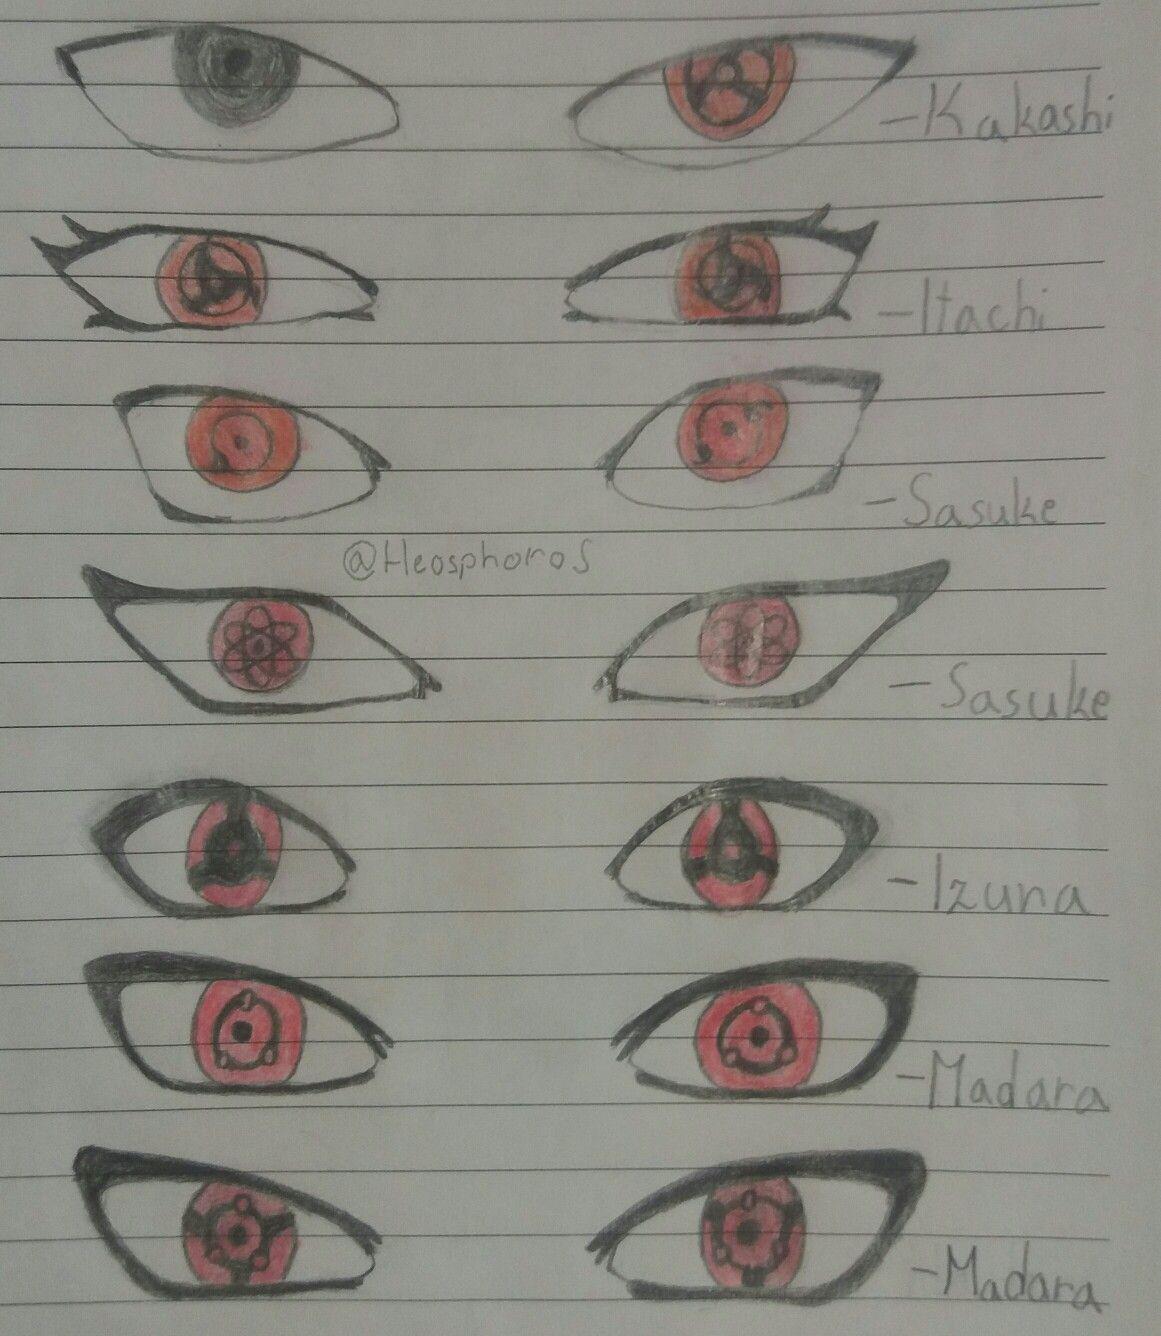 Sharingan Sharingan Eyes Kakashi Itachi Sasuke Izuna Madara Uchihas Drawing Itachi Kakashi Izu